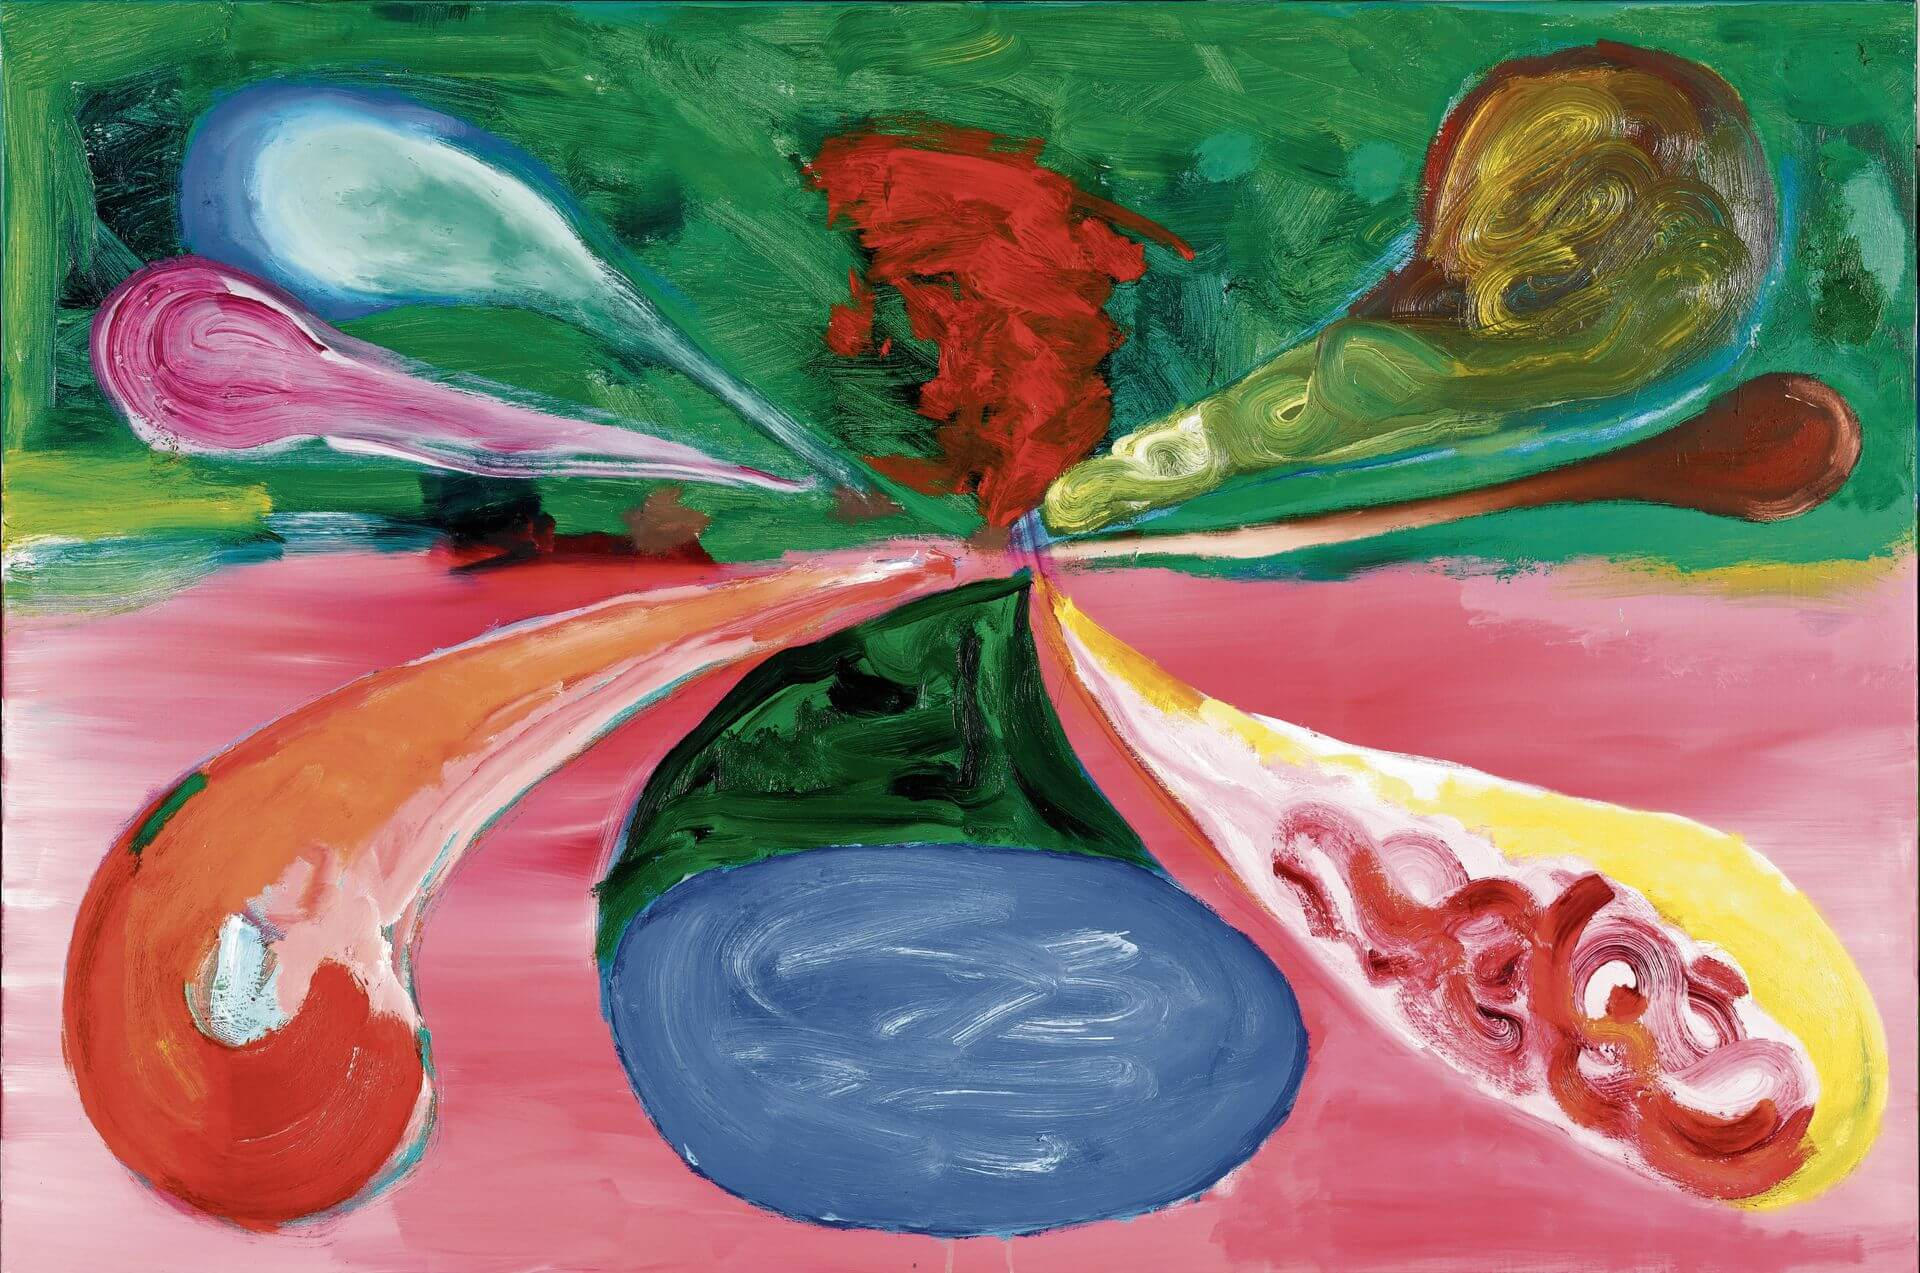 Zonder titel (Rob van Koningsbruggen, 2007)